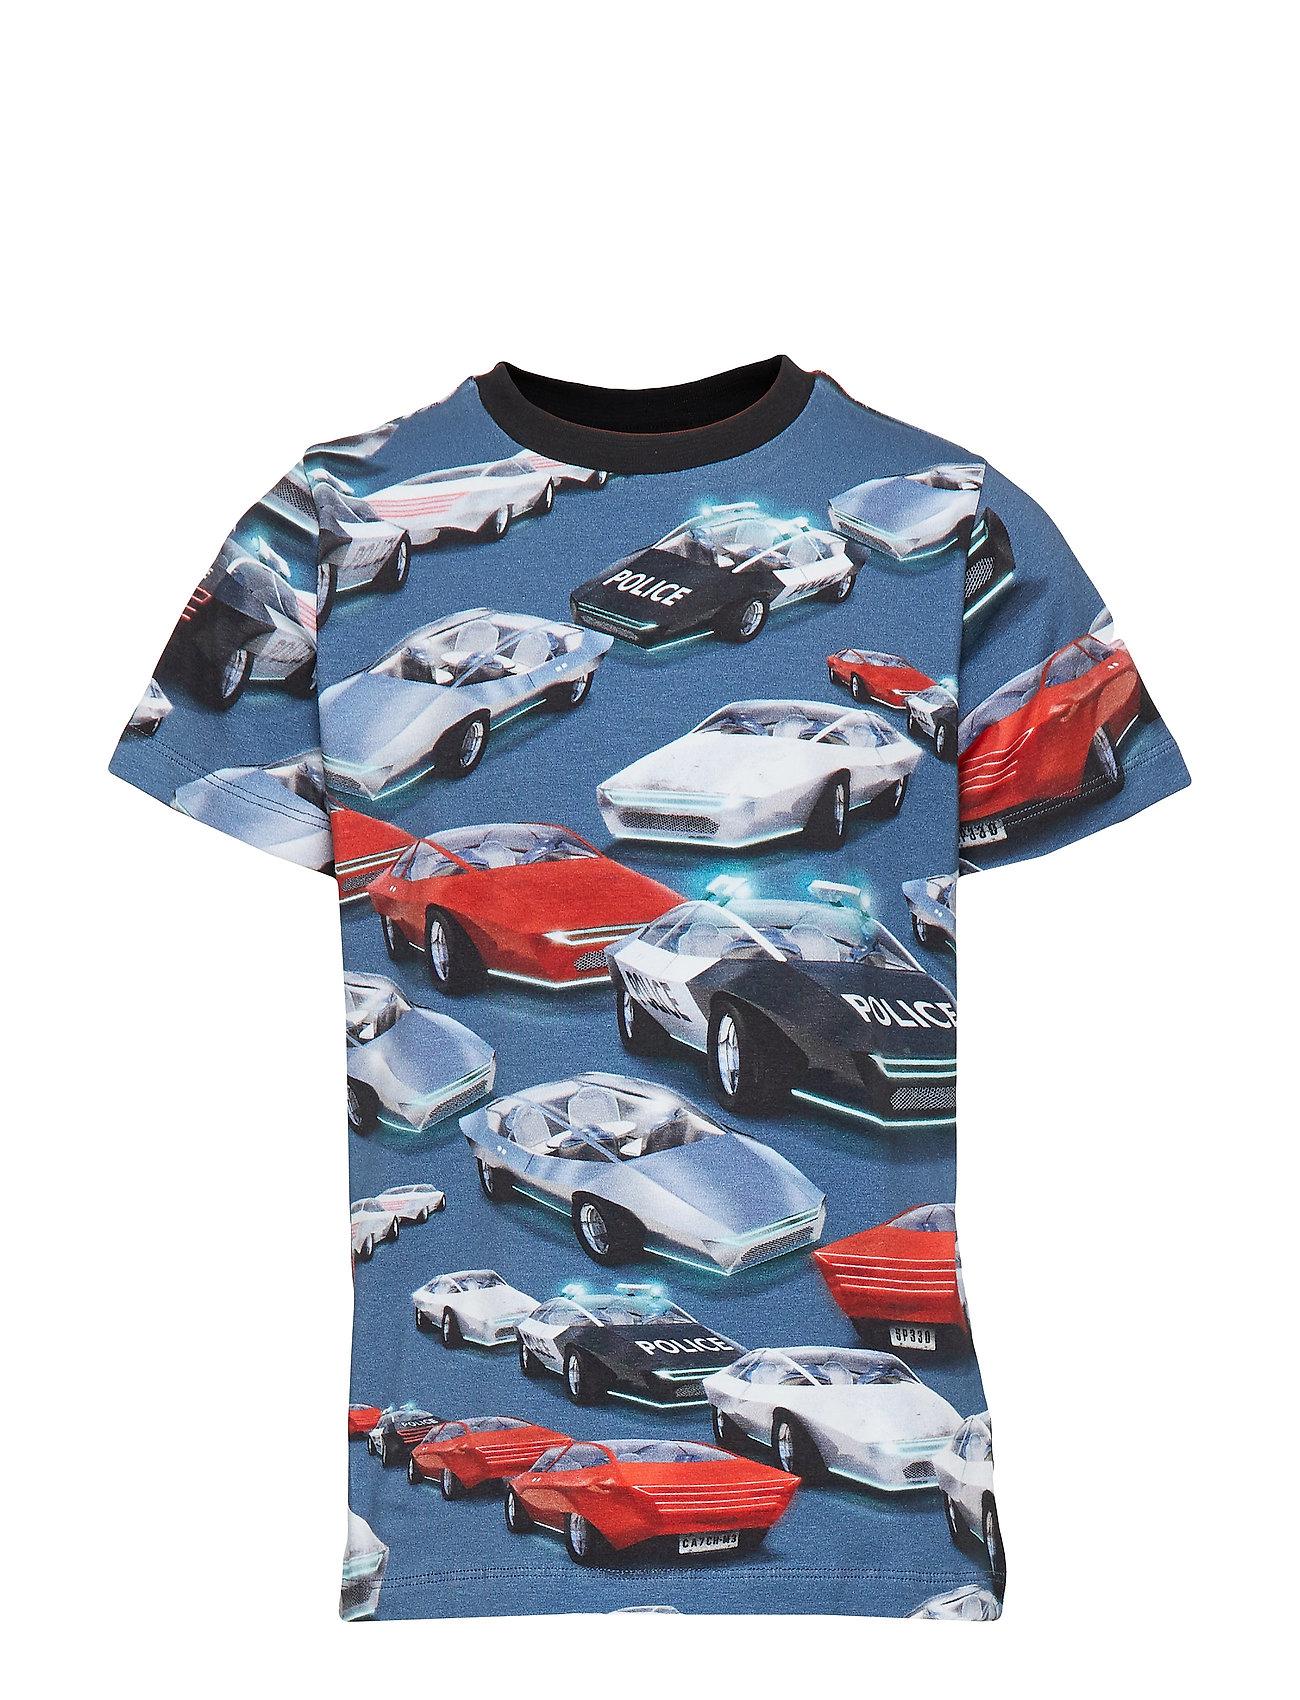 Molo Ralphie - SELF-DRIVING CARS